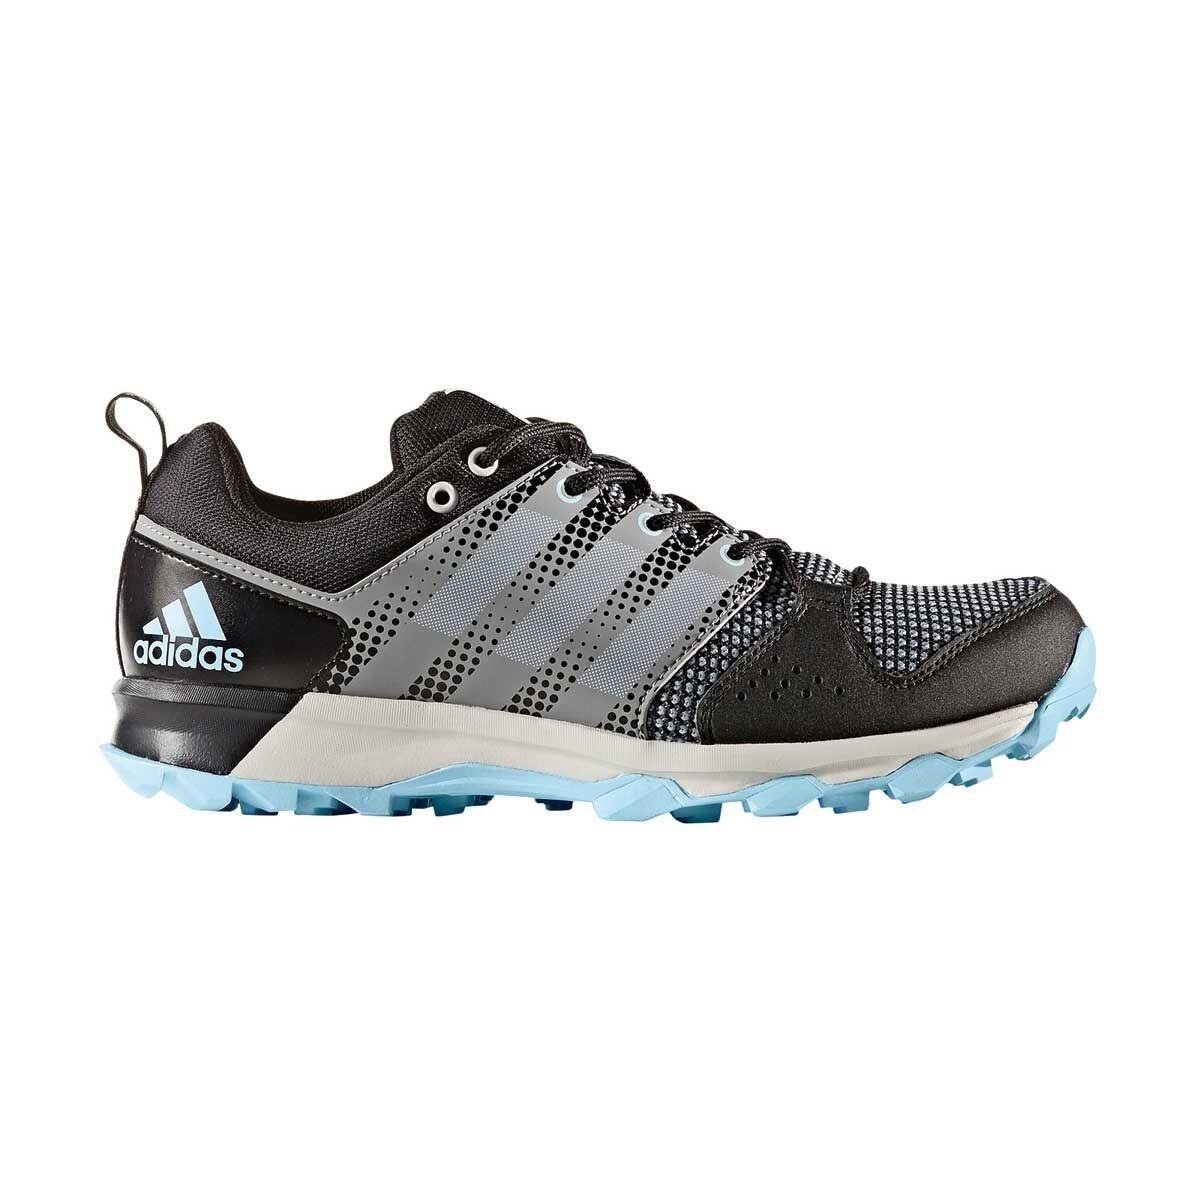 Shoes Blue 5 Trail Adidas 8 Womens Black Running Us Galaxy BrhCsdxtQ